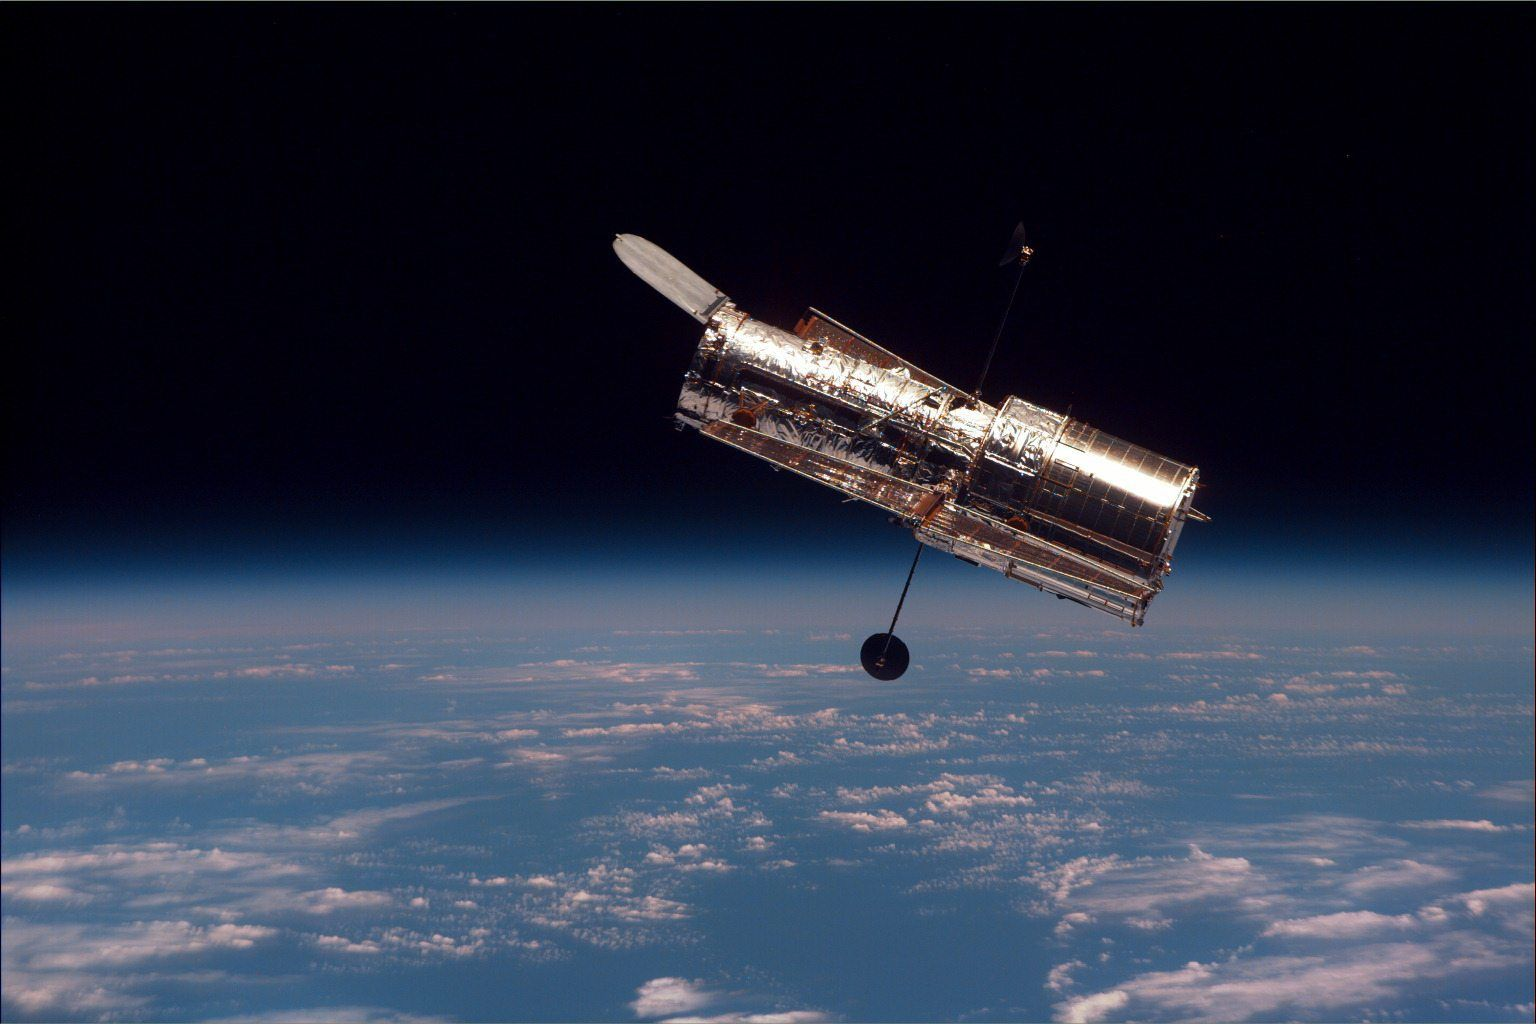 Hubble Deep Field: A foto que mudou a Astronomia - http://www.showmetech.com.br/hubble-deep-field-a-foto-que-mudou-a-astronomia/